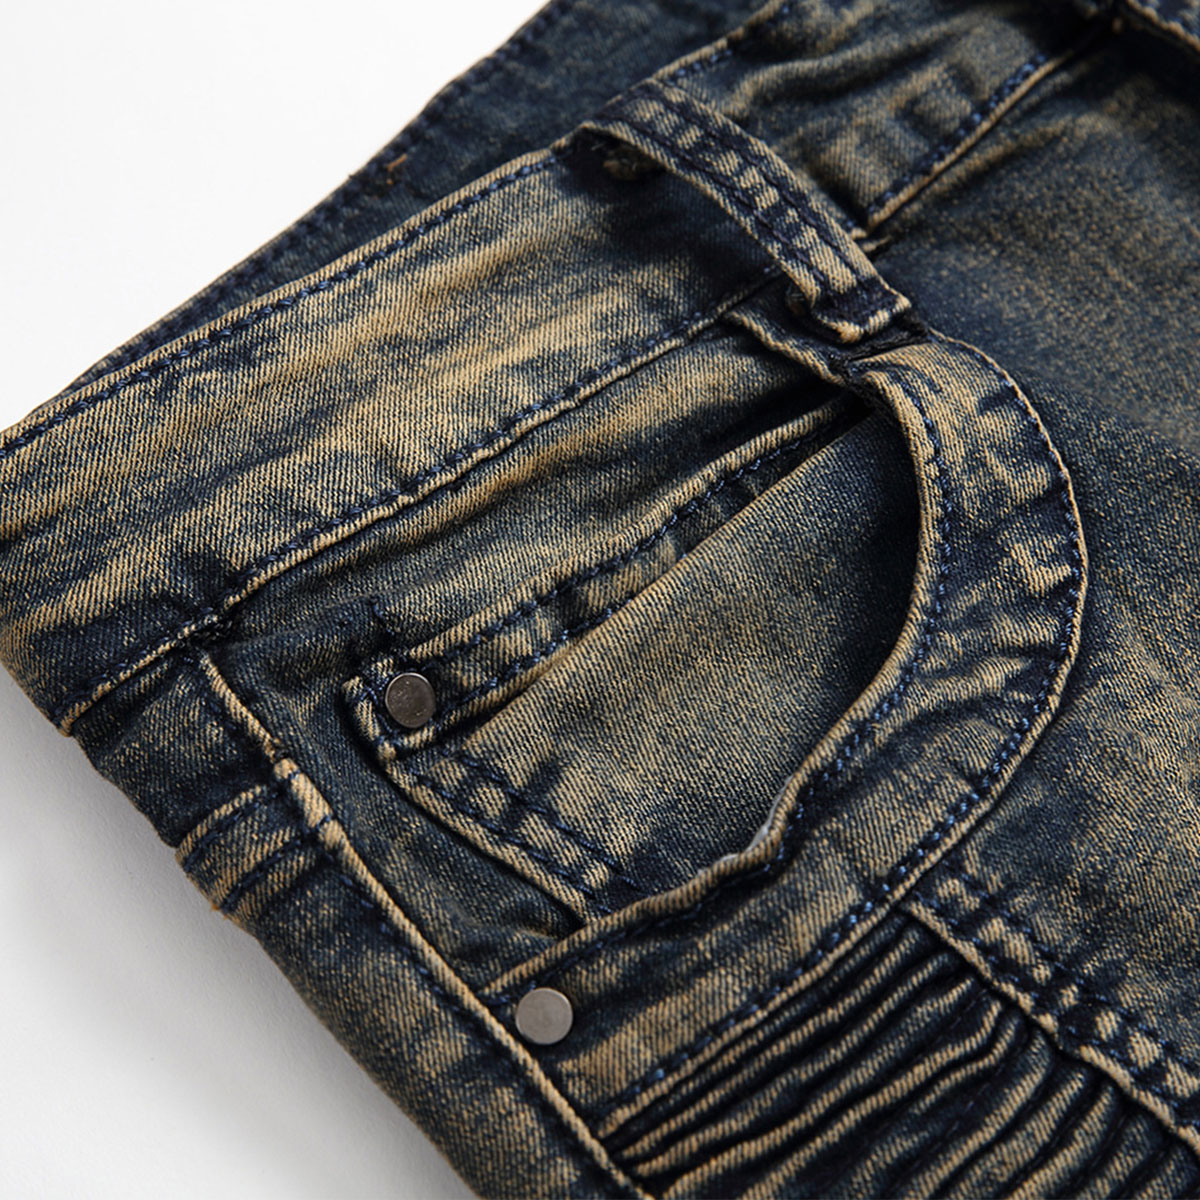 Men-039-s-Skinny-Biker-Jeans-Destroyed-Slim-Fit-Denim-Ripped-Pencil-Pants-Trousers thumbnail 17